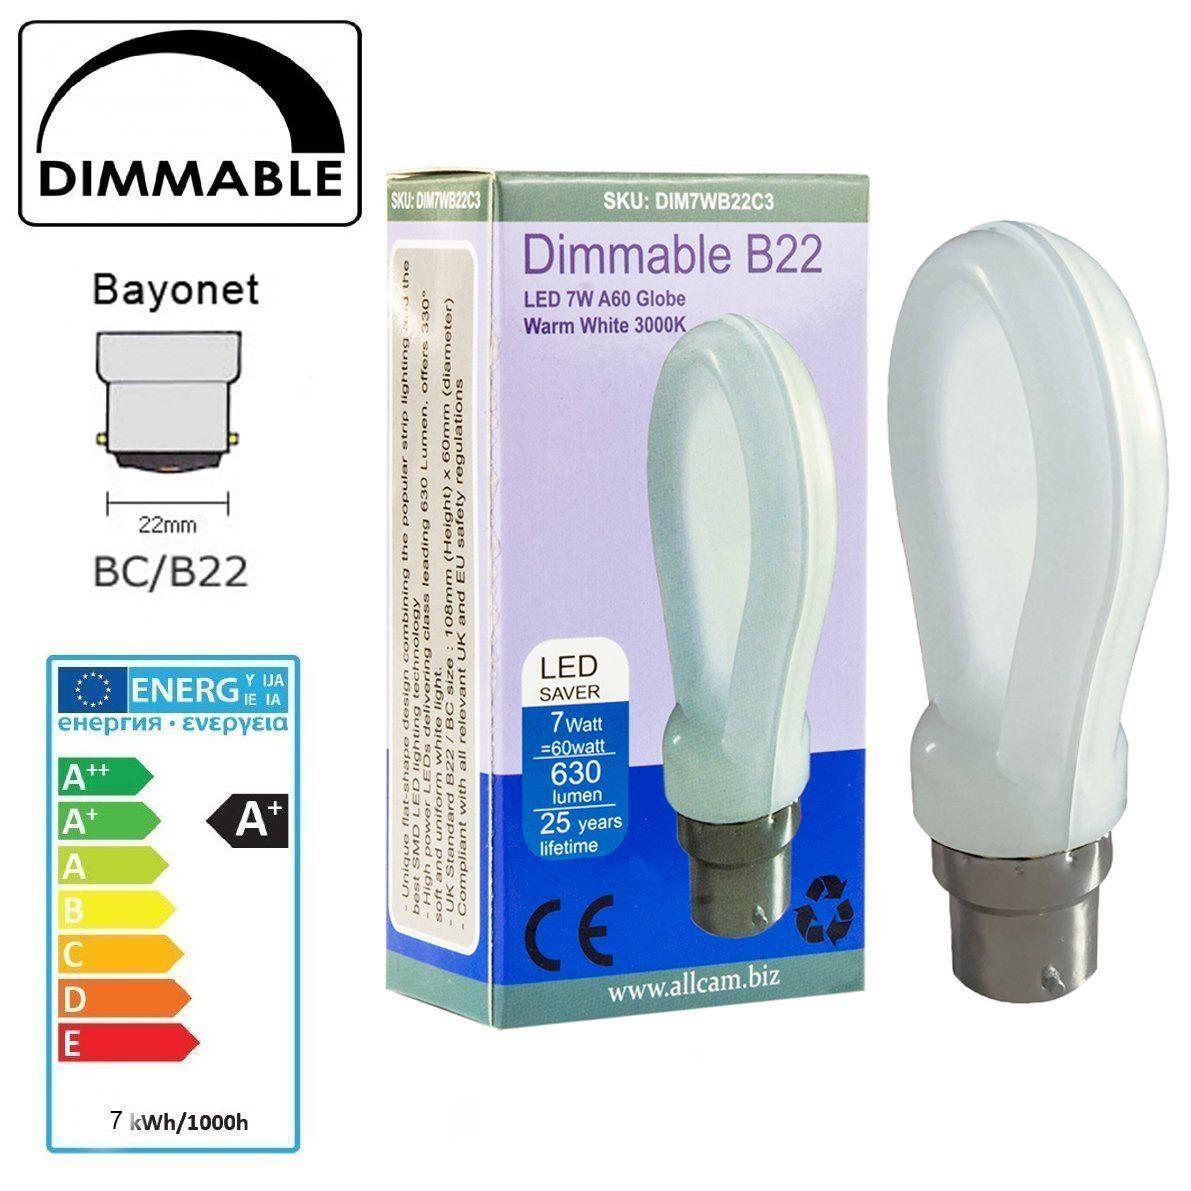 Allcam E27 B22 Led Bulbs Dimmable Regular 10w 7w Globe Cool White Warm White Ebay